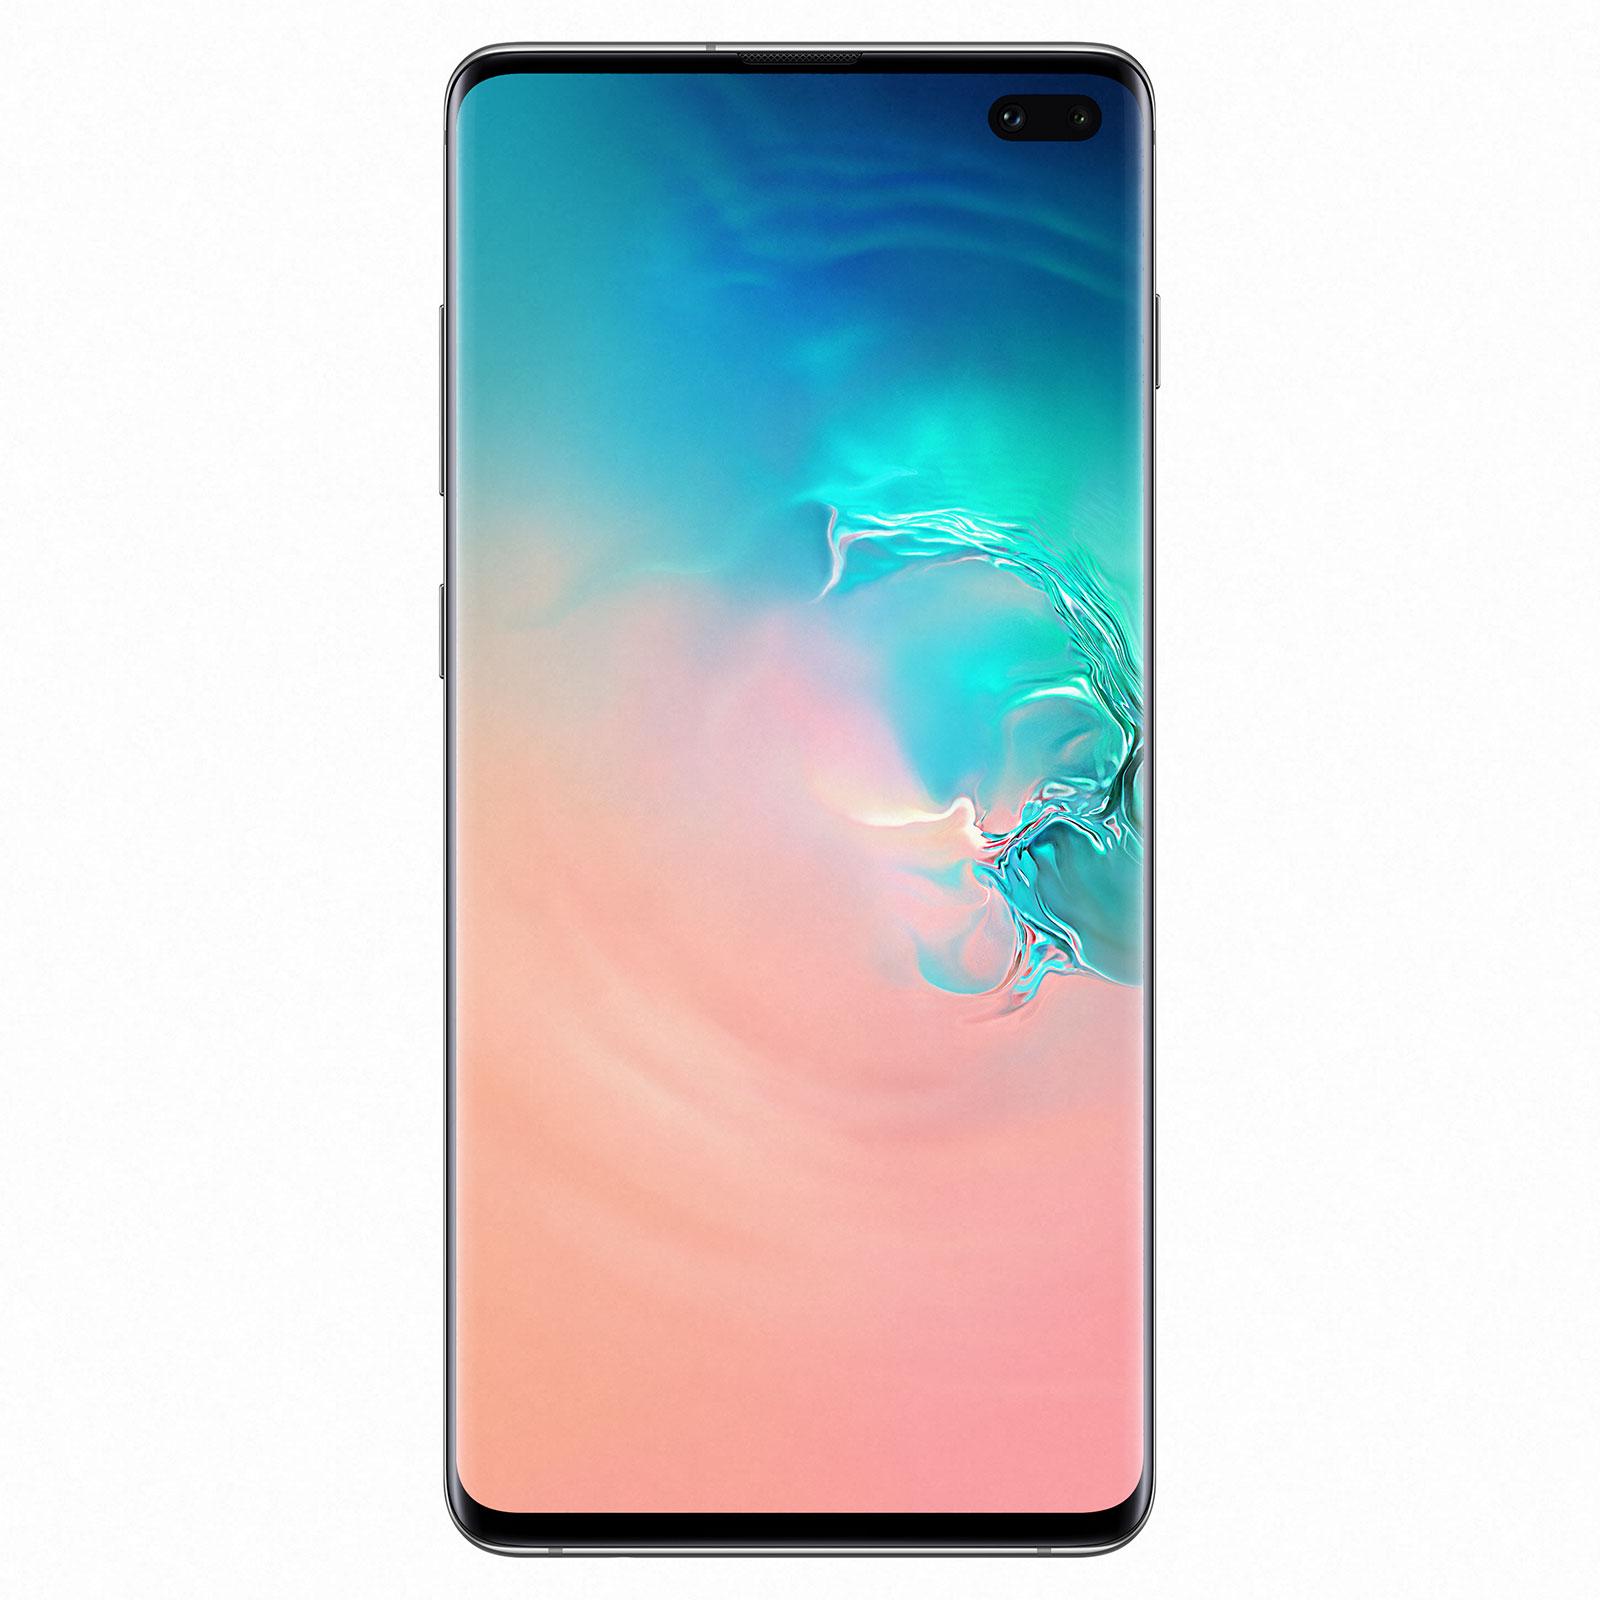 "Mobile & smartphone Samsung Galaxy S10+ SM-G975F Blanc Prisme (8 Go / 128 Go) Smartphone 4G-LTE Advanced Dual SIM IP68 - Exynos 9820 8-Core 2.8 GHz - RAM 8 Go - Ecran tactile Super AMOLED 6.4"" 1440 x 3040 - 128 Go - NFC/Bluetooth 5.0 - 4100 mAh - Android 9.0"